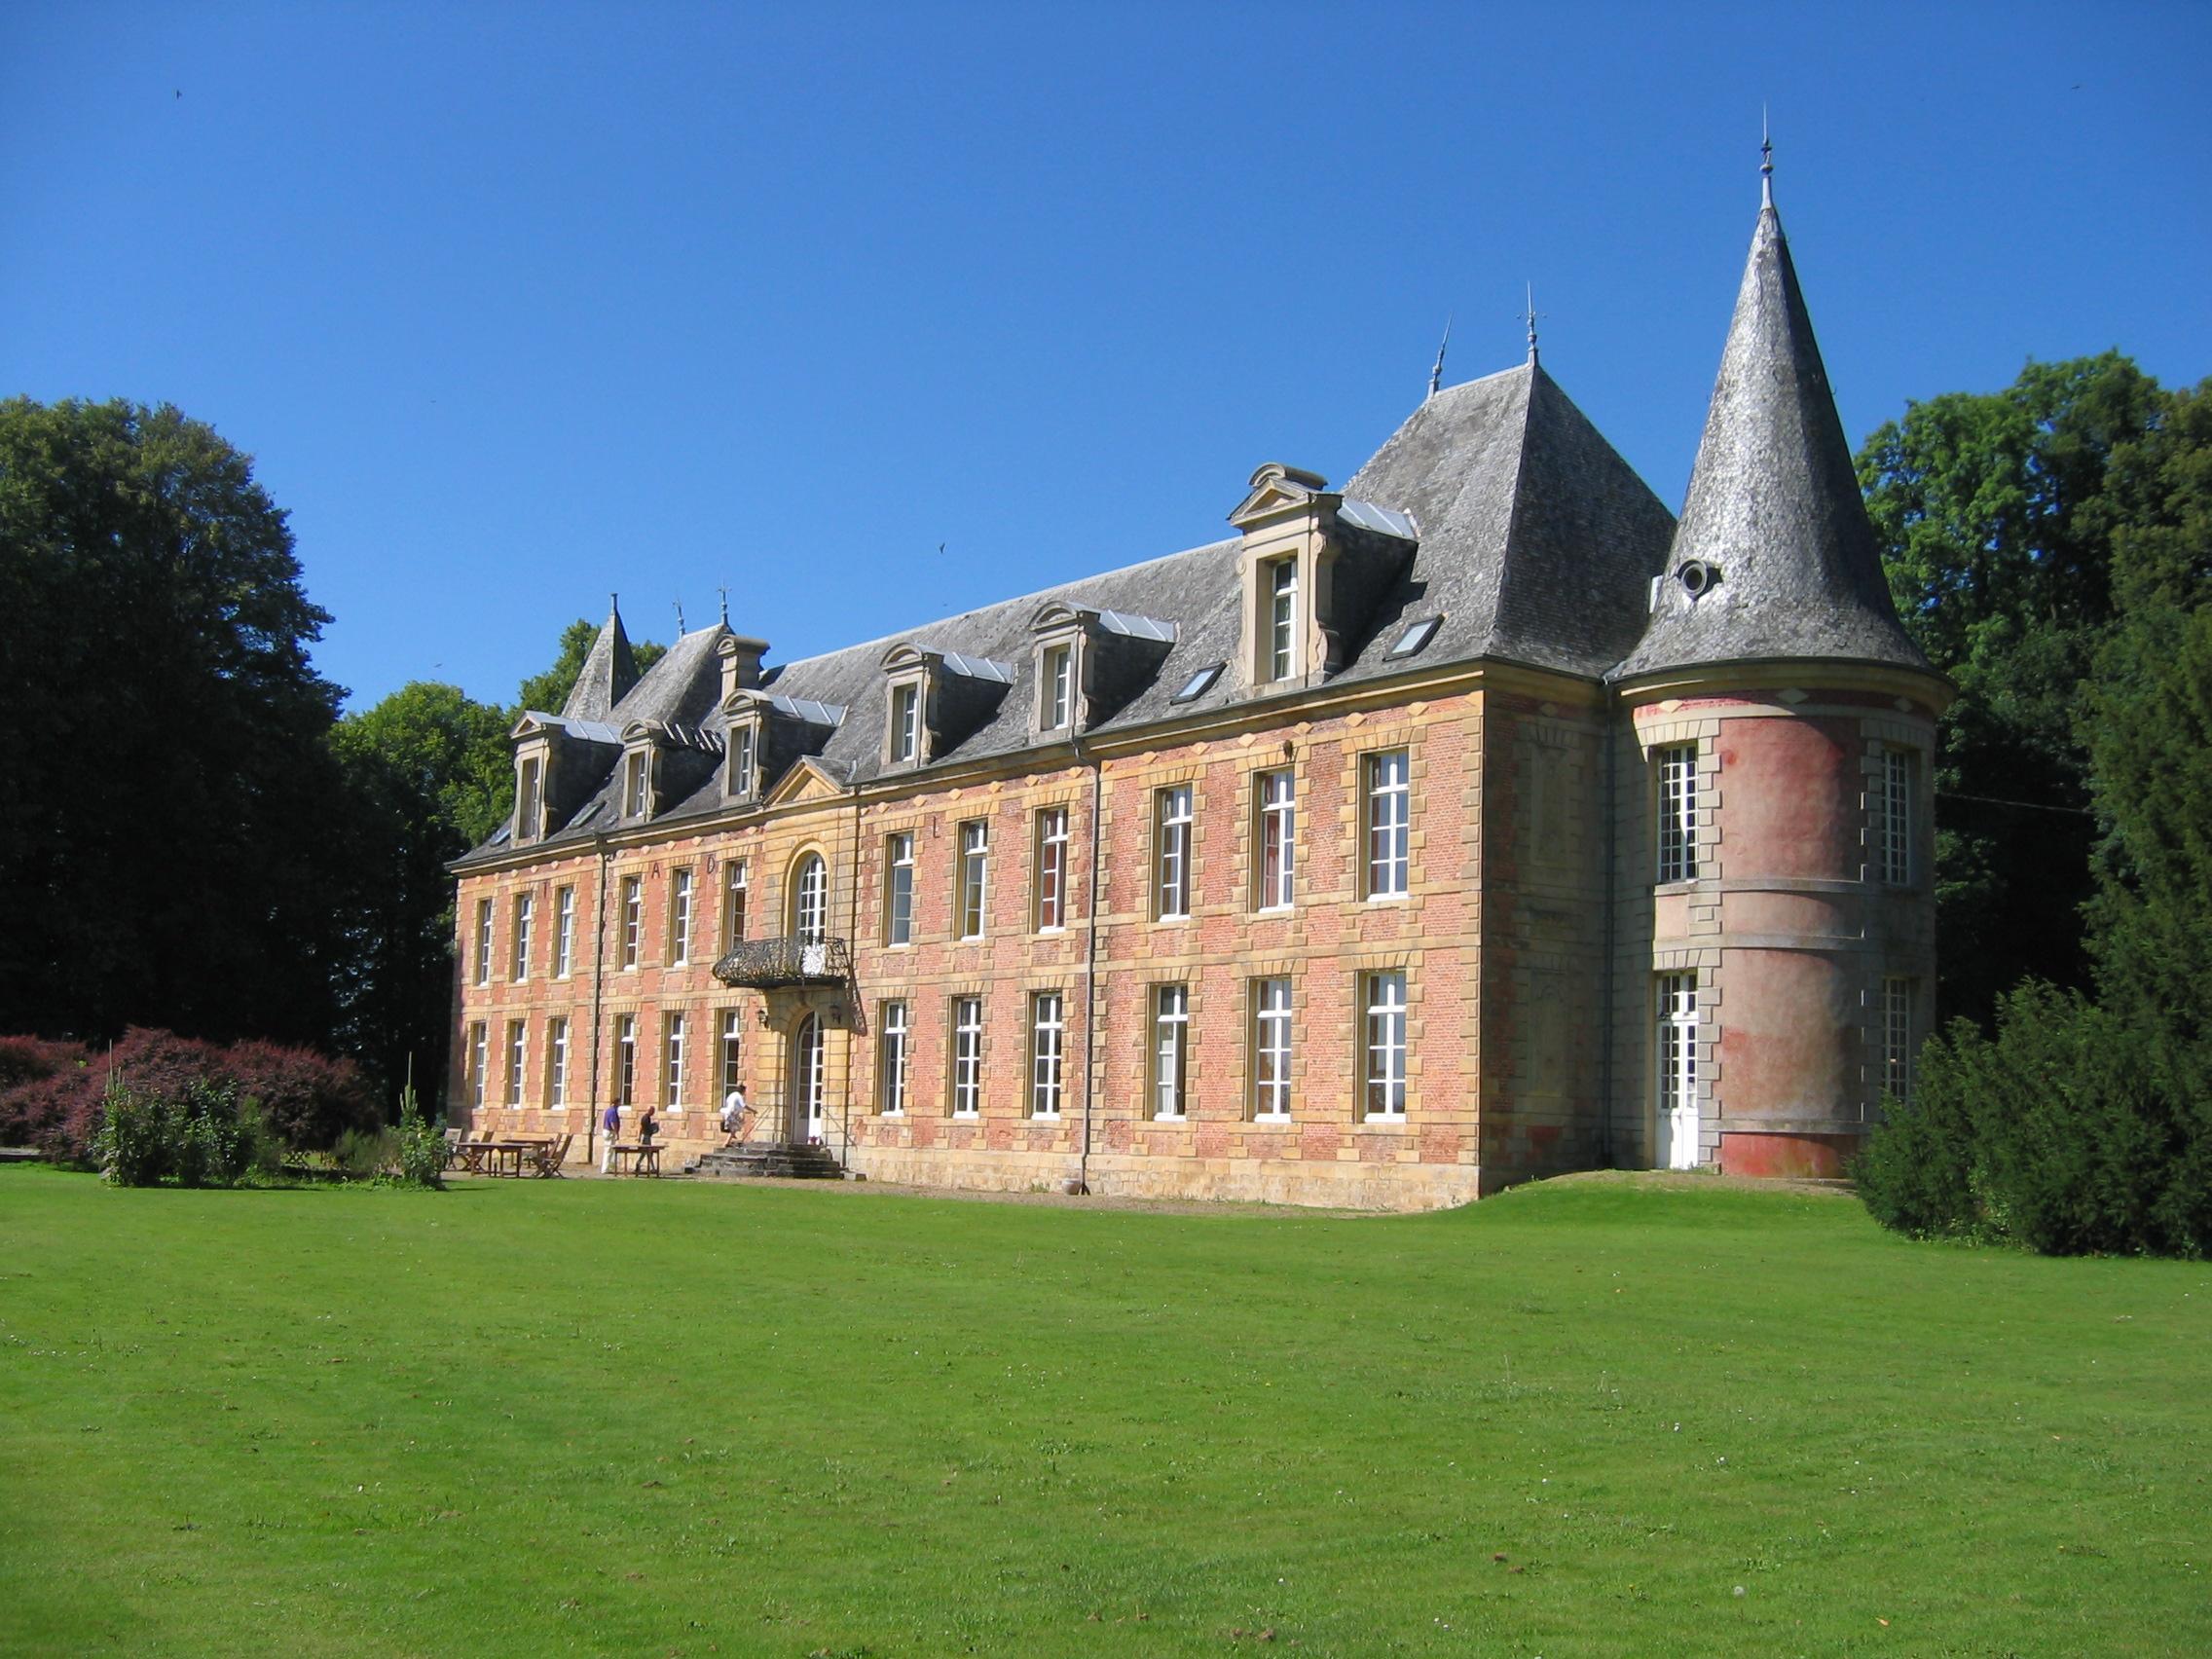 https://upload.wikimedia.org/wikipedia/commons/e/e0/Abbaye_Notre-Dame_des_Sept-Fontaines_Fagnon_Ardennes_France_V1.JPG